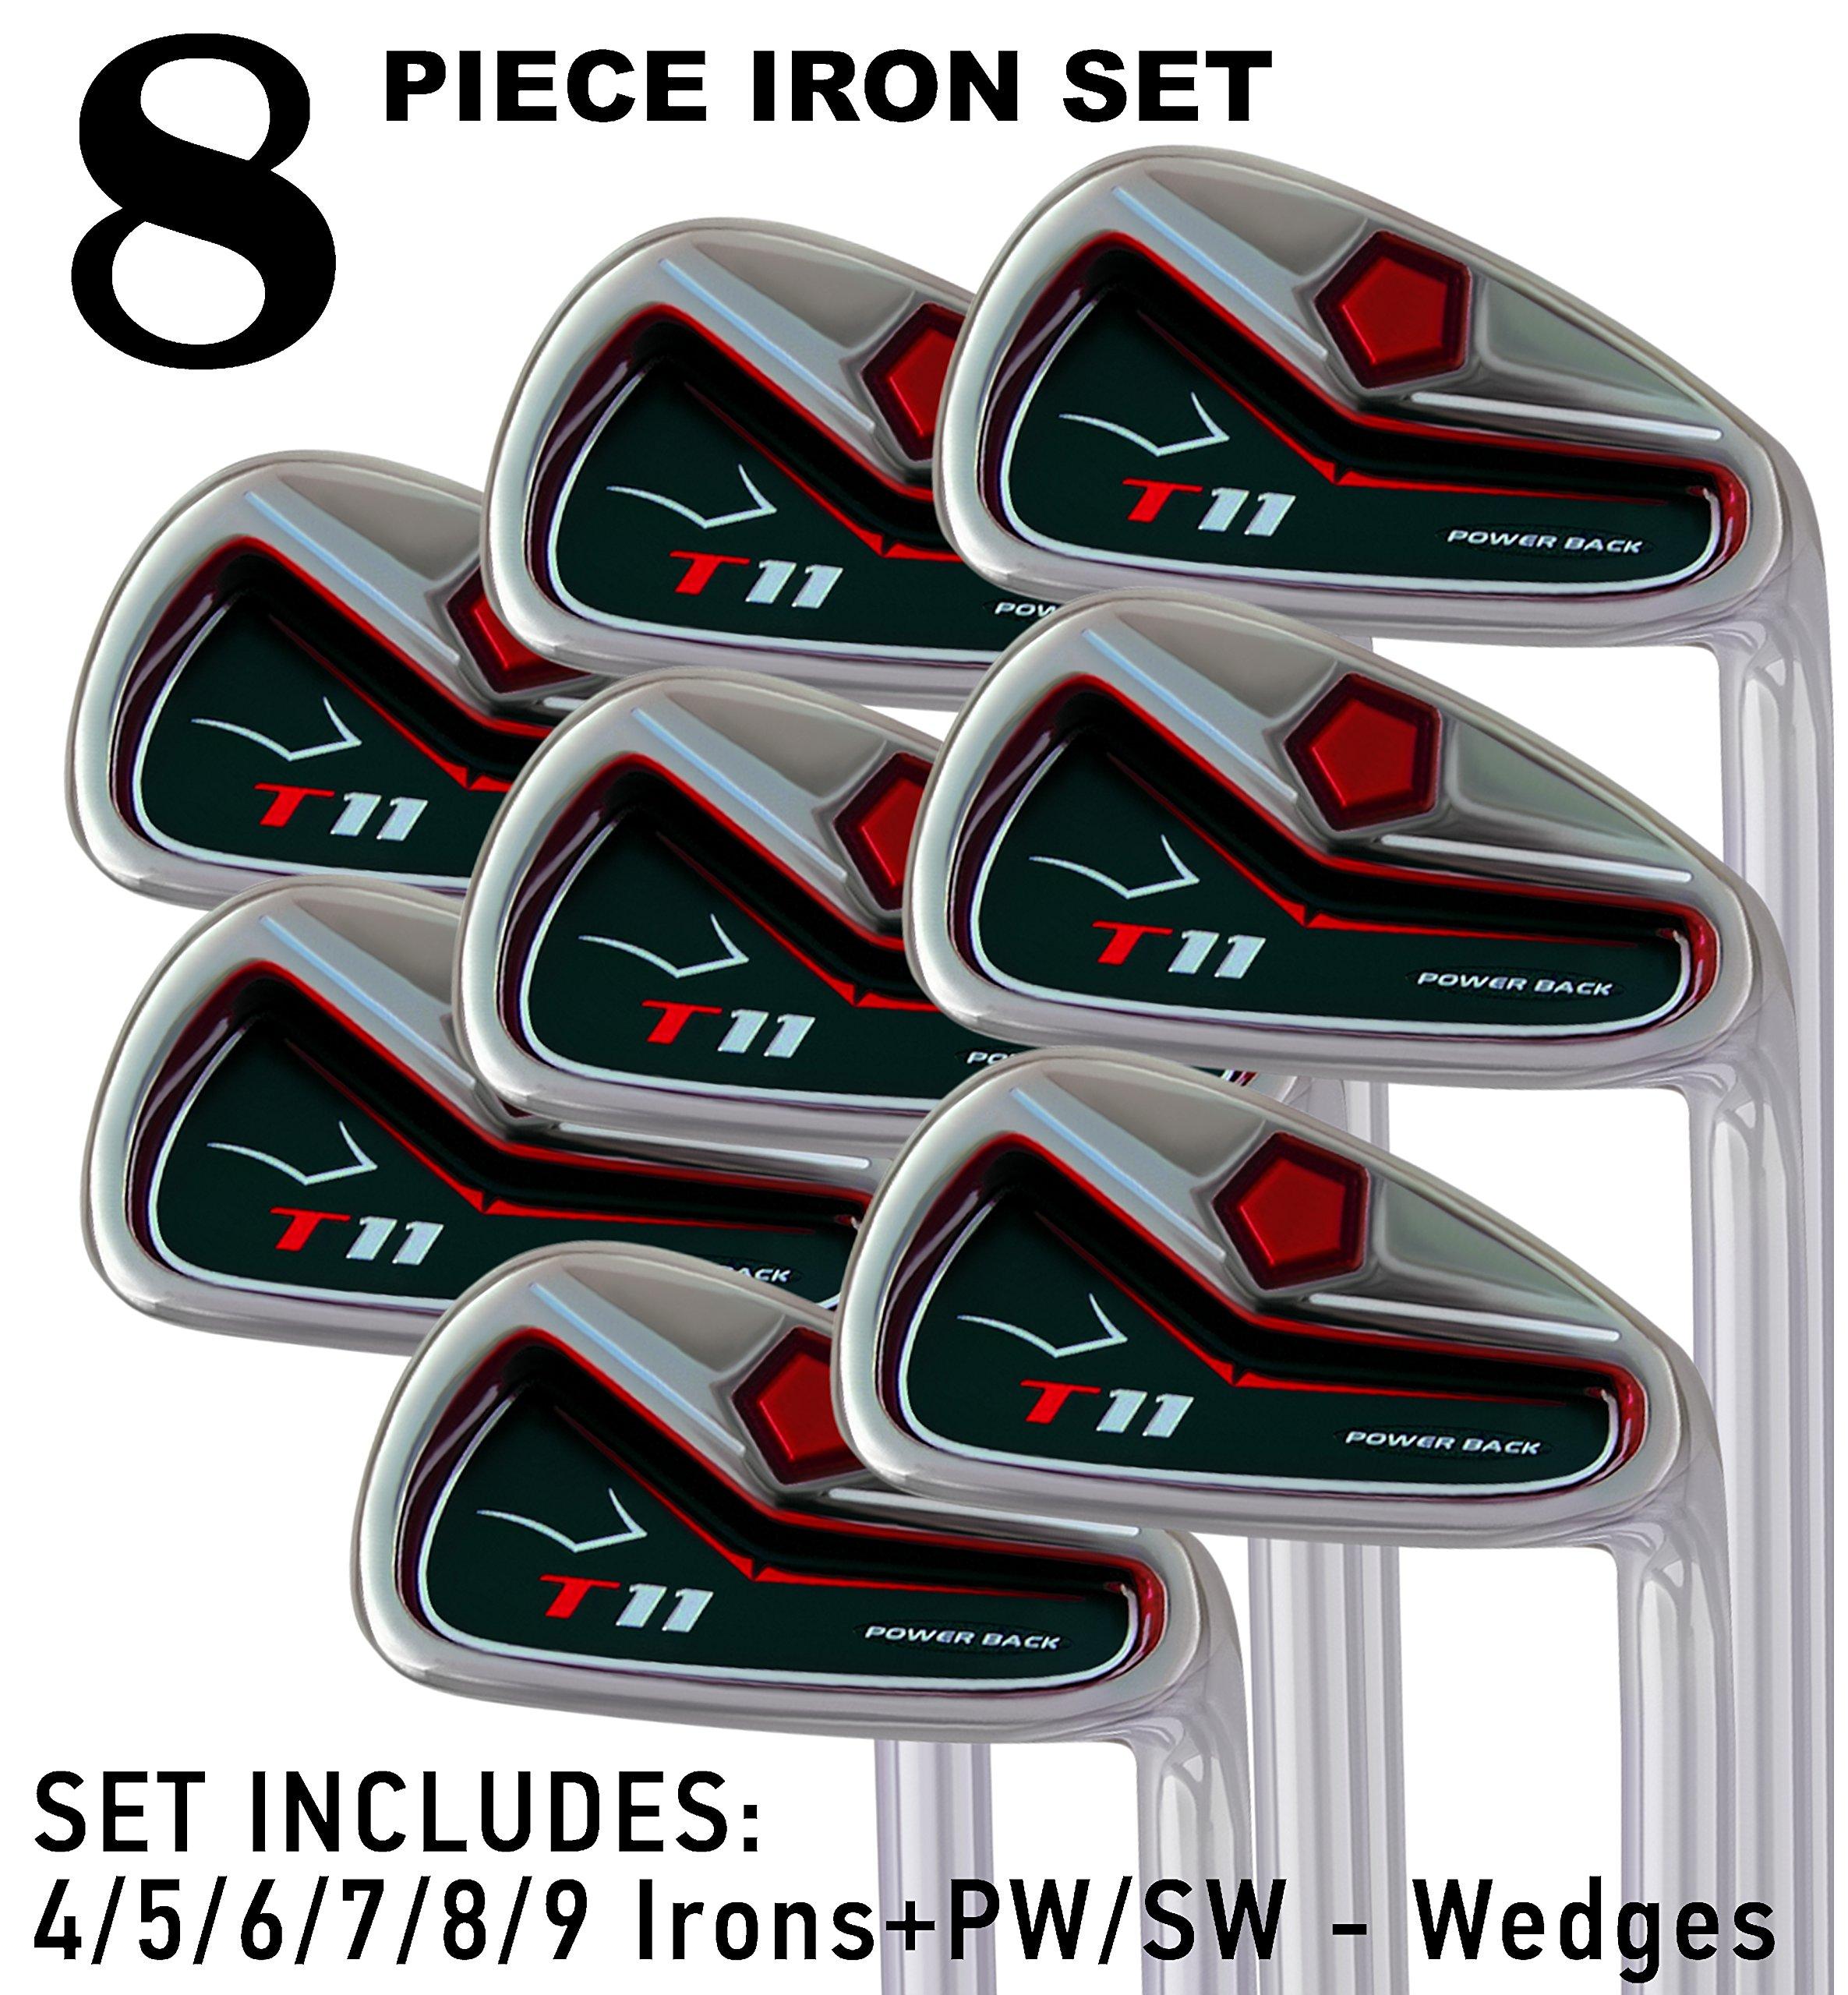 T11 Power Back Tall Iron Set 4-SW Custom Made Golf Clubs Right Hand Regular R Flex Steel Shafts JUMBO Tacki-Mac Grips +2'' Longer Men's Standard Irons